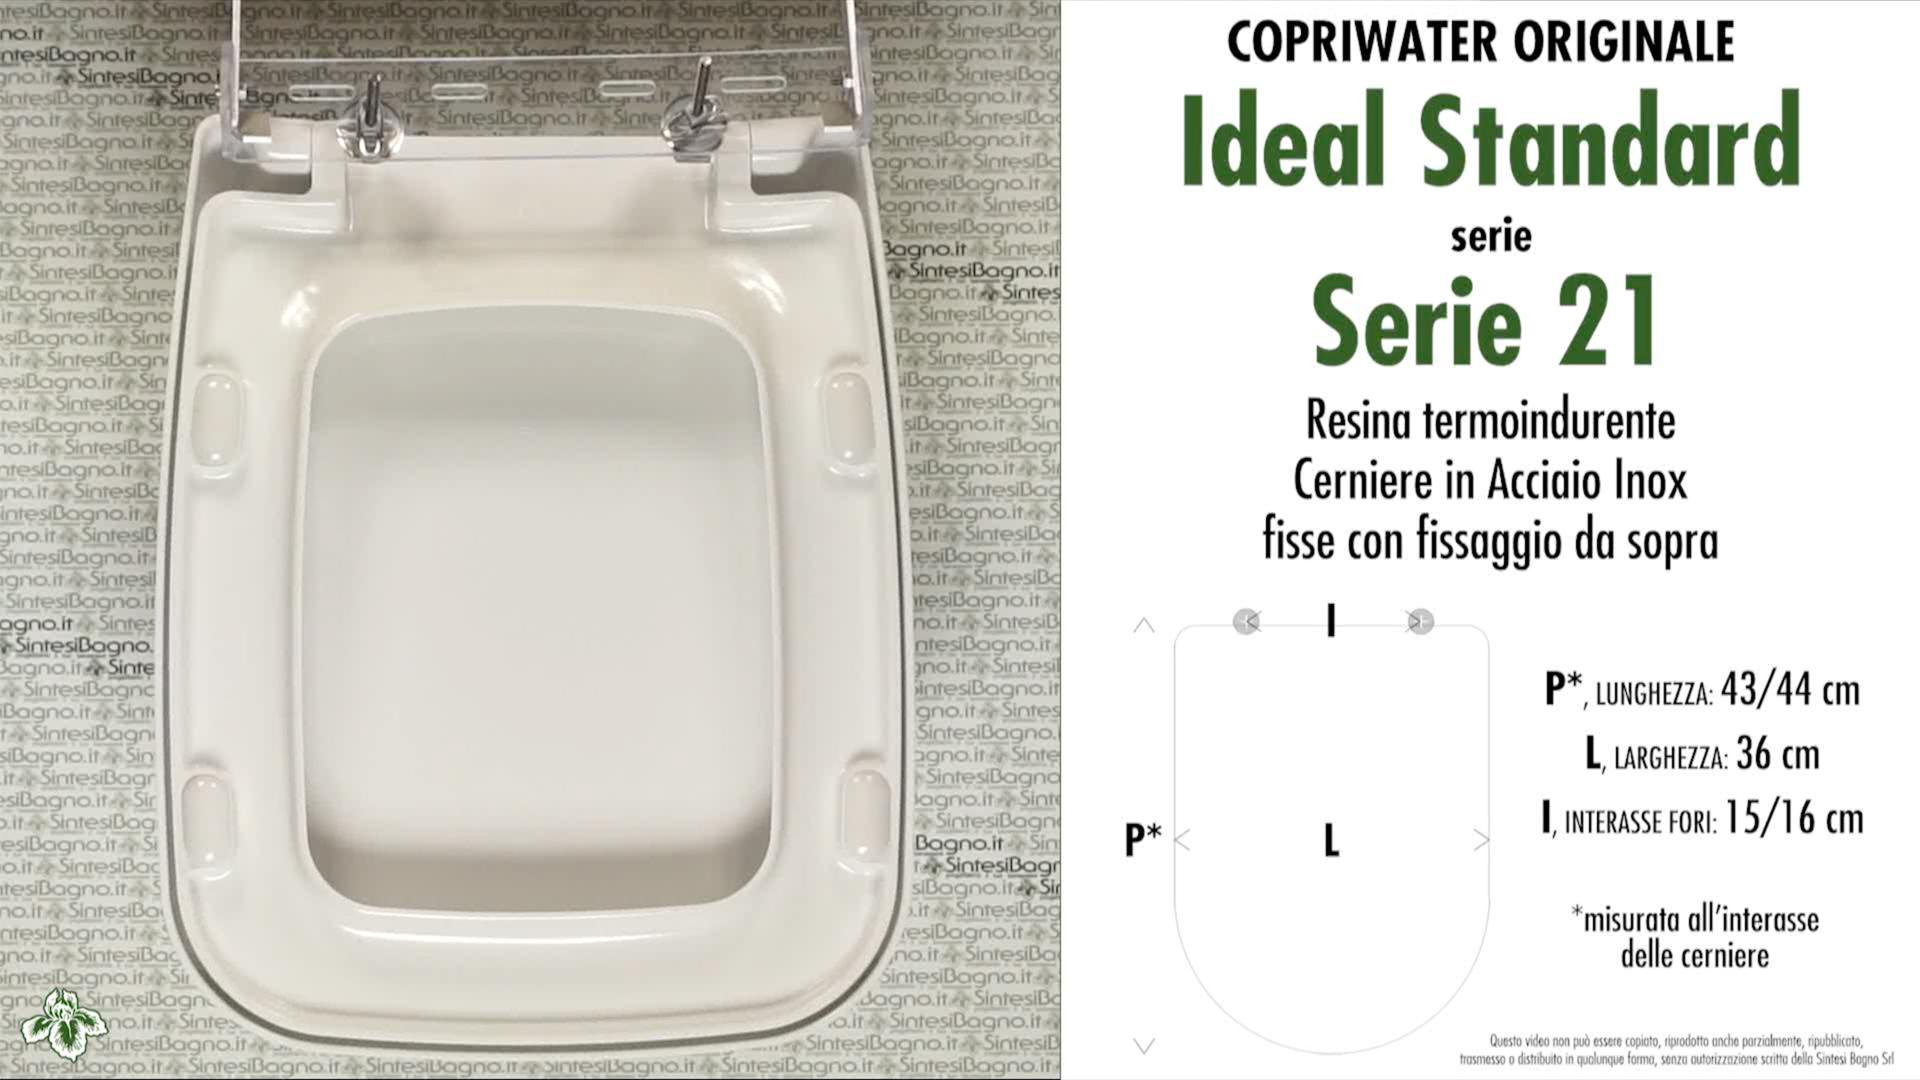 Copriwater Sedile Wc Serie 21 Ideal Standard Tipo Originale